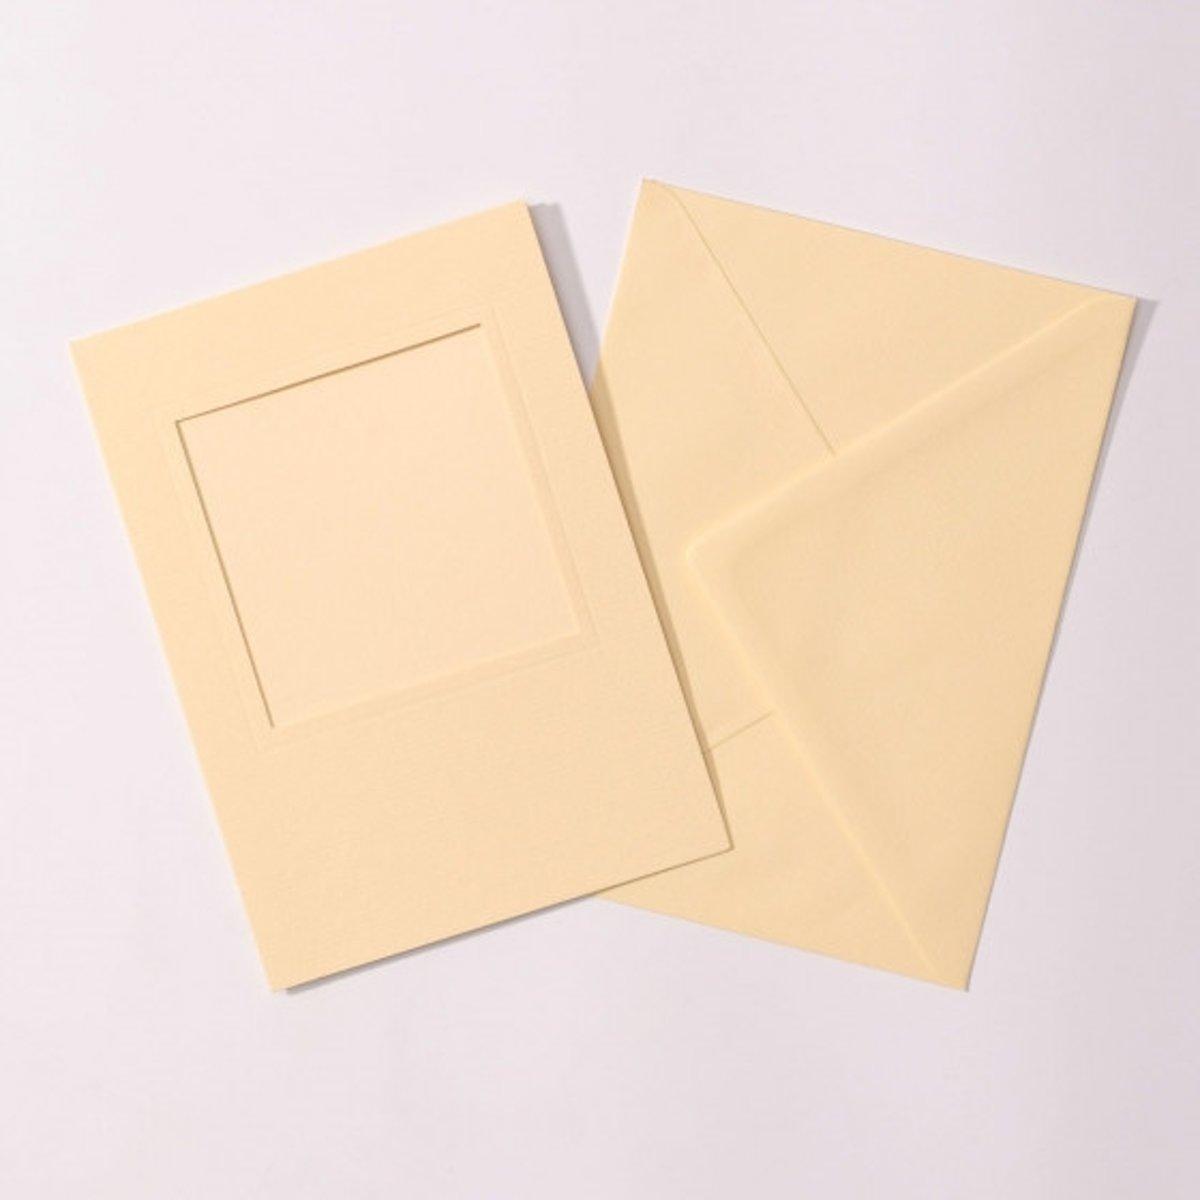 Afbeelding van product Passep. vierkant 5 st. creme